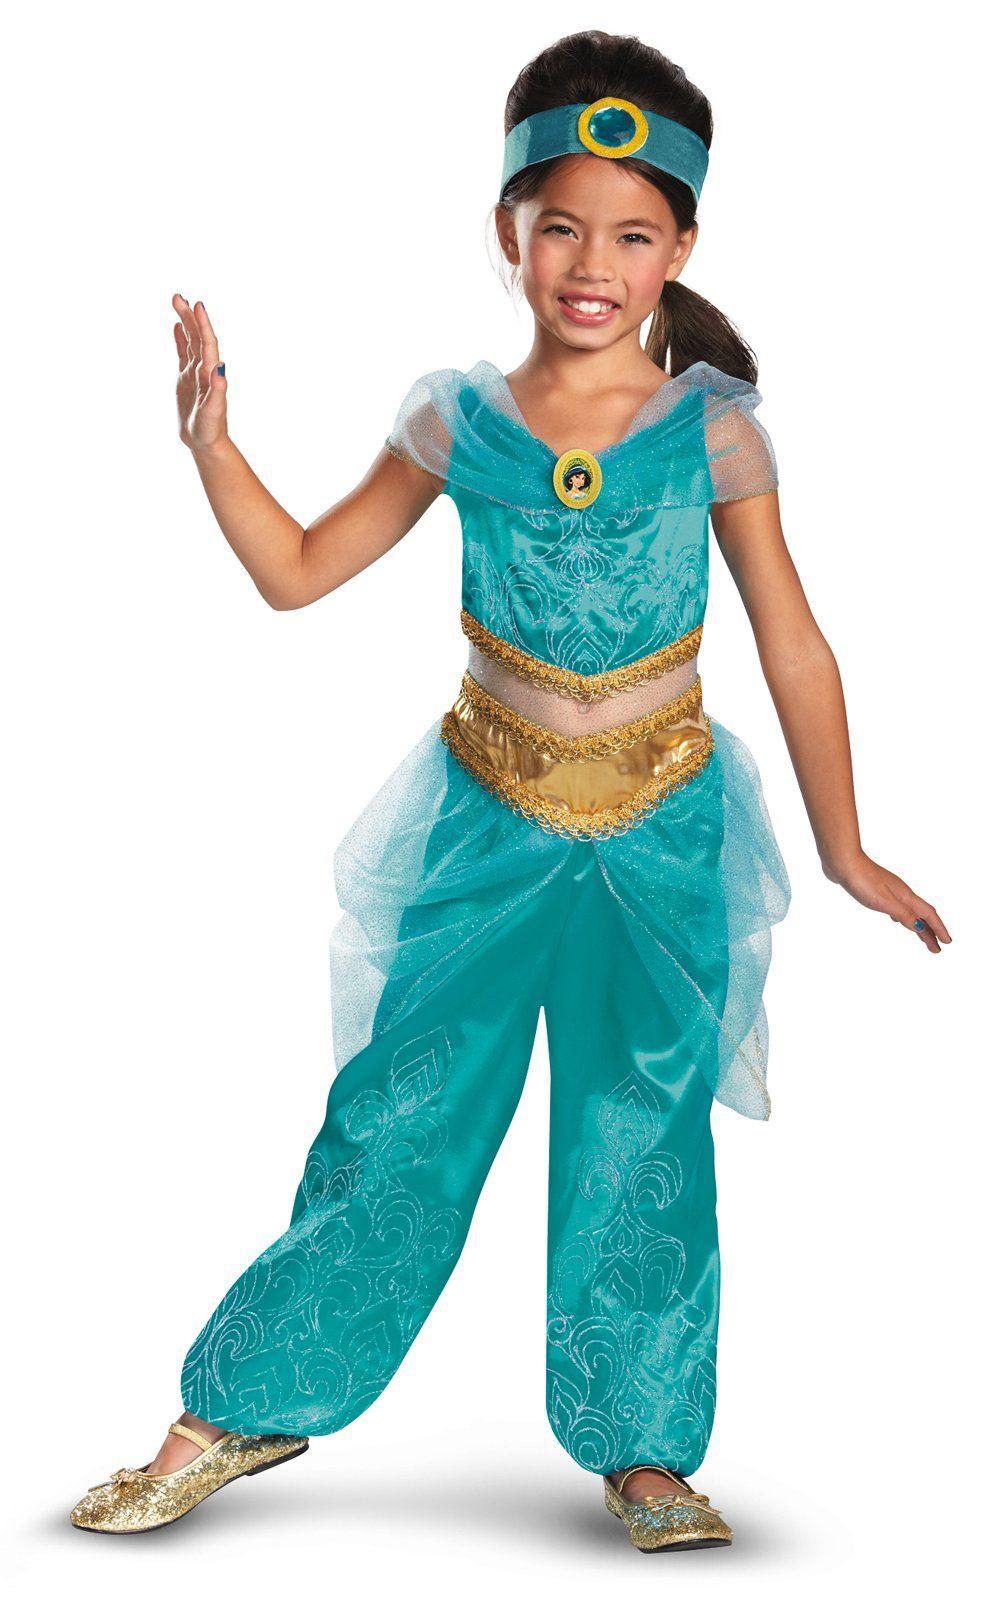 eca7e7c29 Disney Jasmine Deluxe Sparkle Toddler / Child Costume   disney ... princess  jasmine costumes